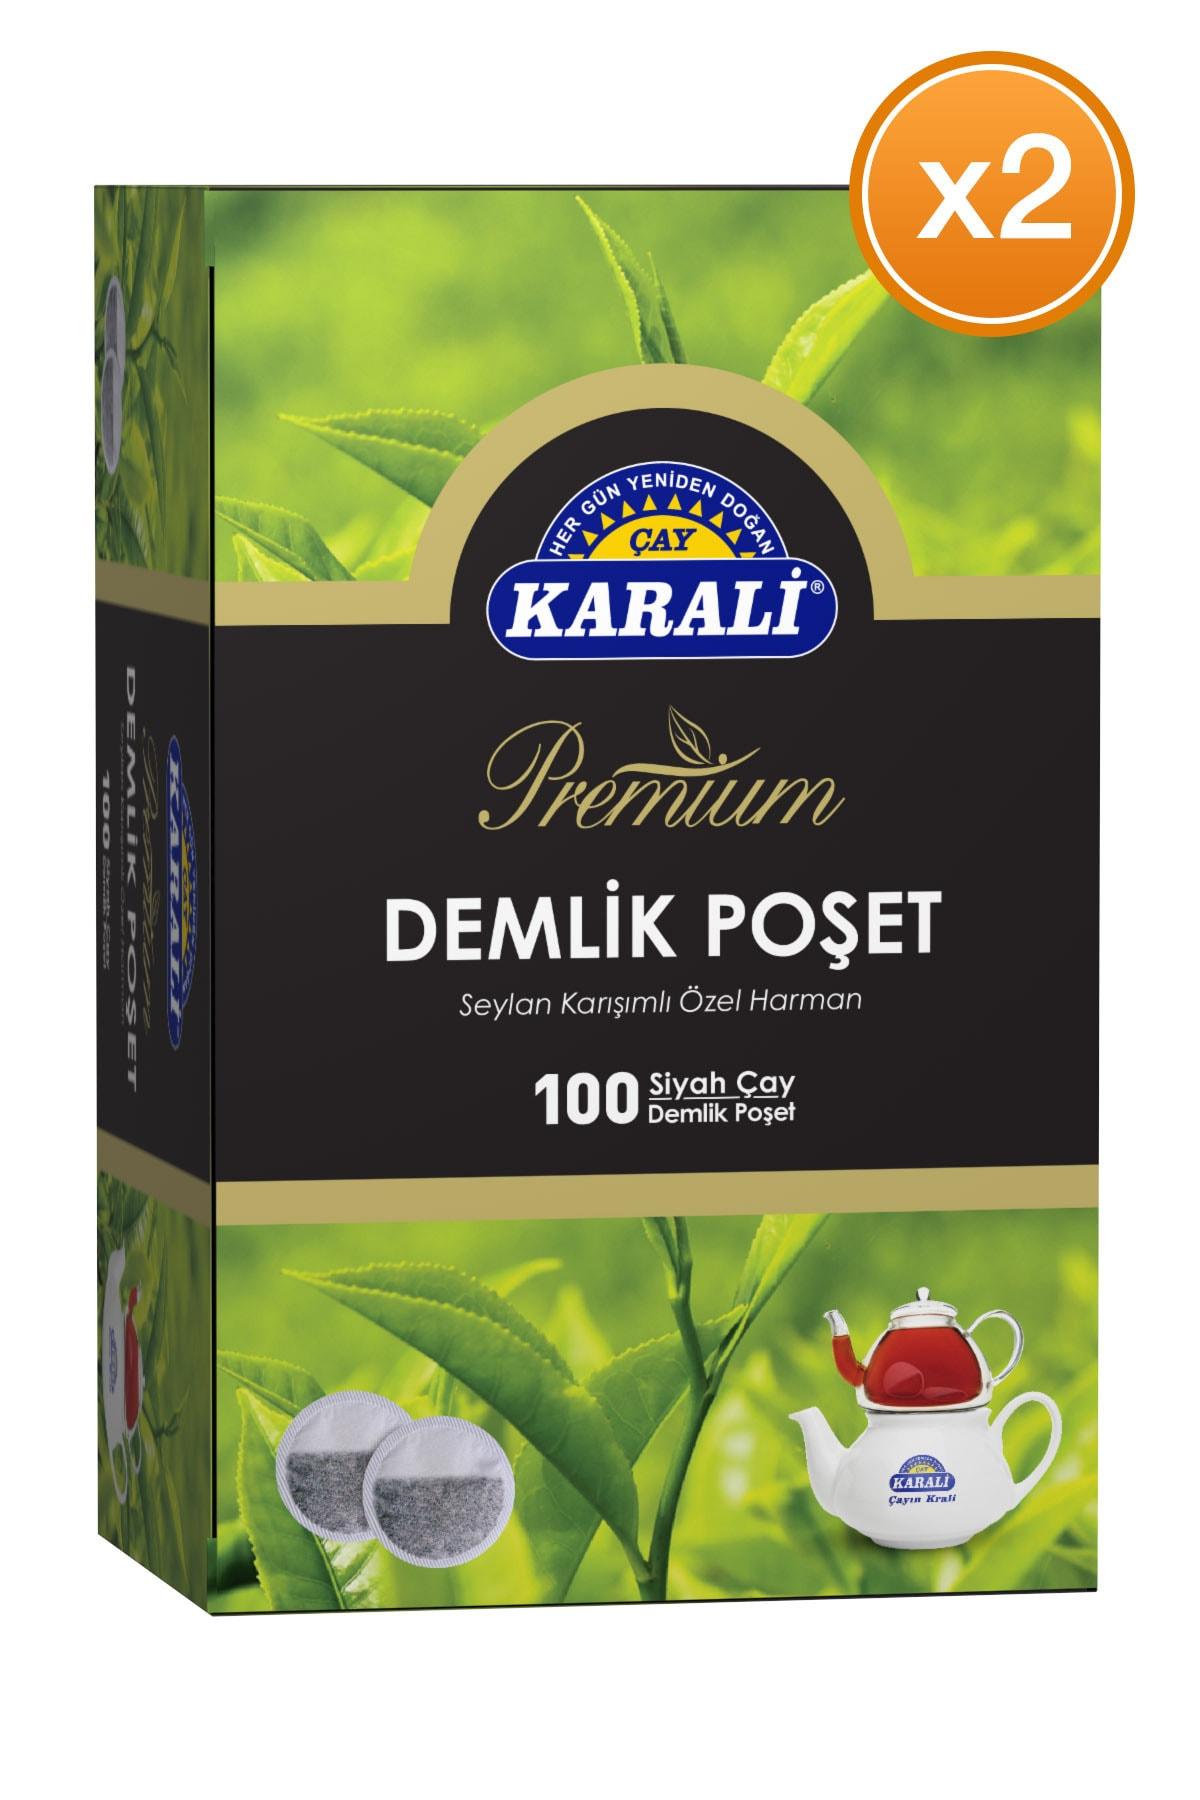 Karali Çay Karali Premium Demlik Poşet Siyah Çay 100x3,2 gr X 2 Adet 1